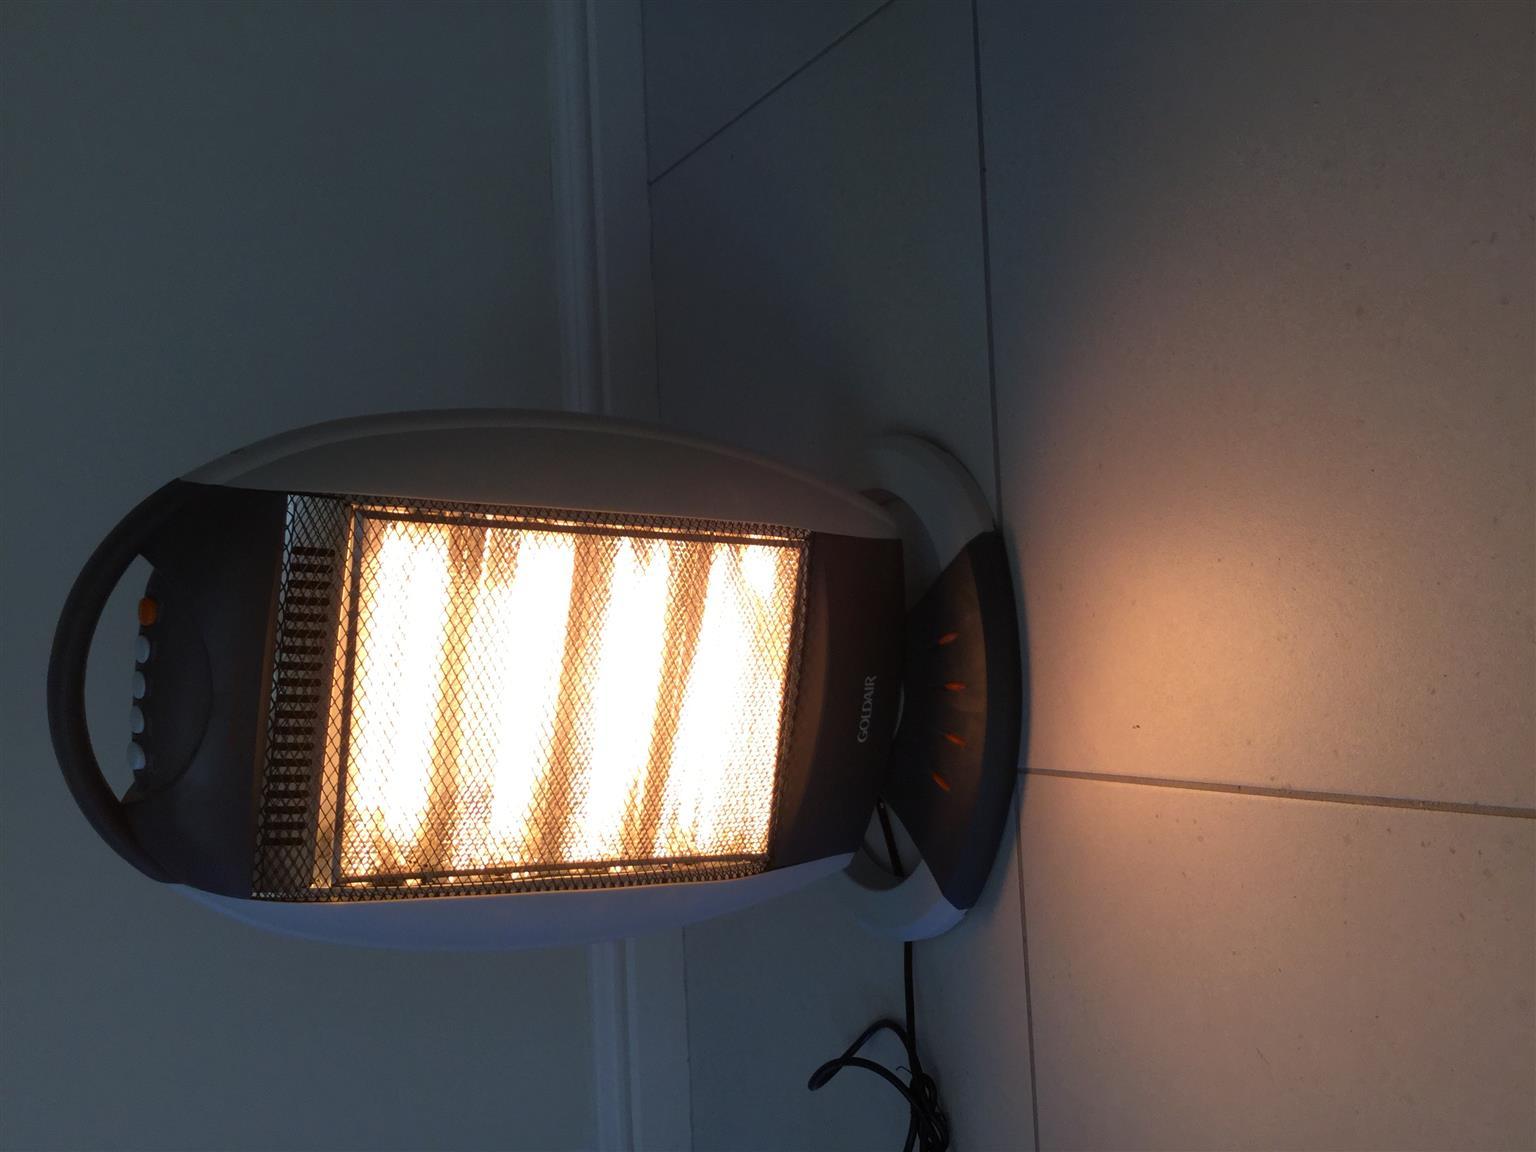 4 bar Holgen heater